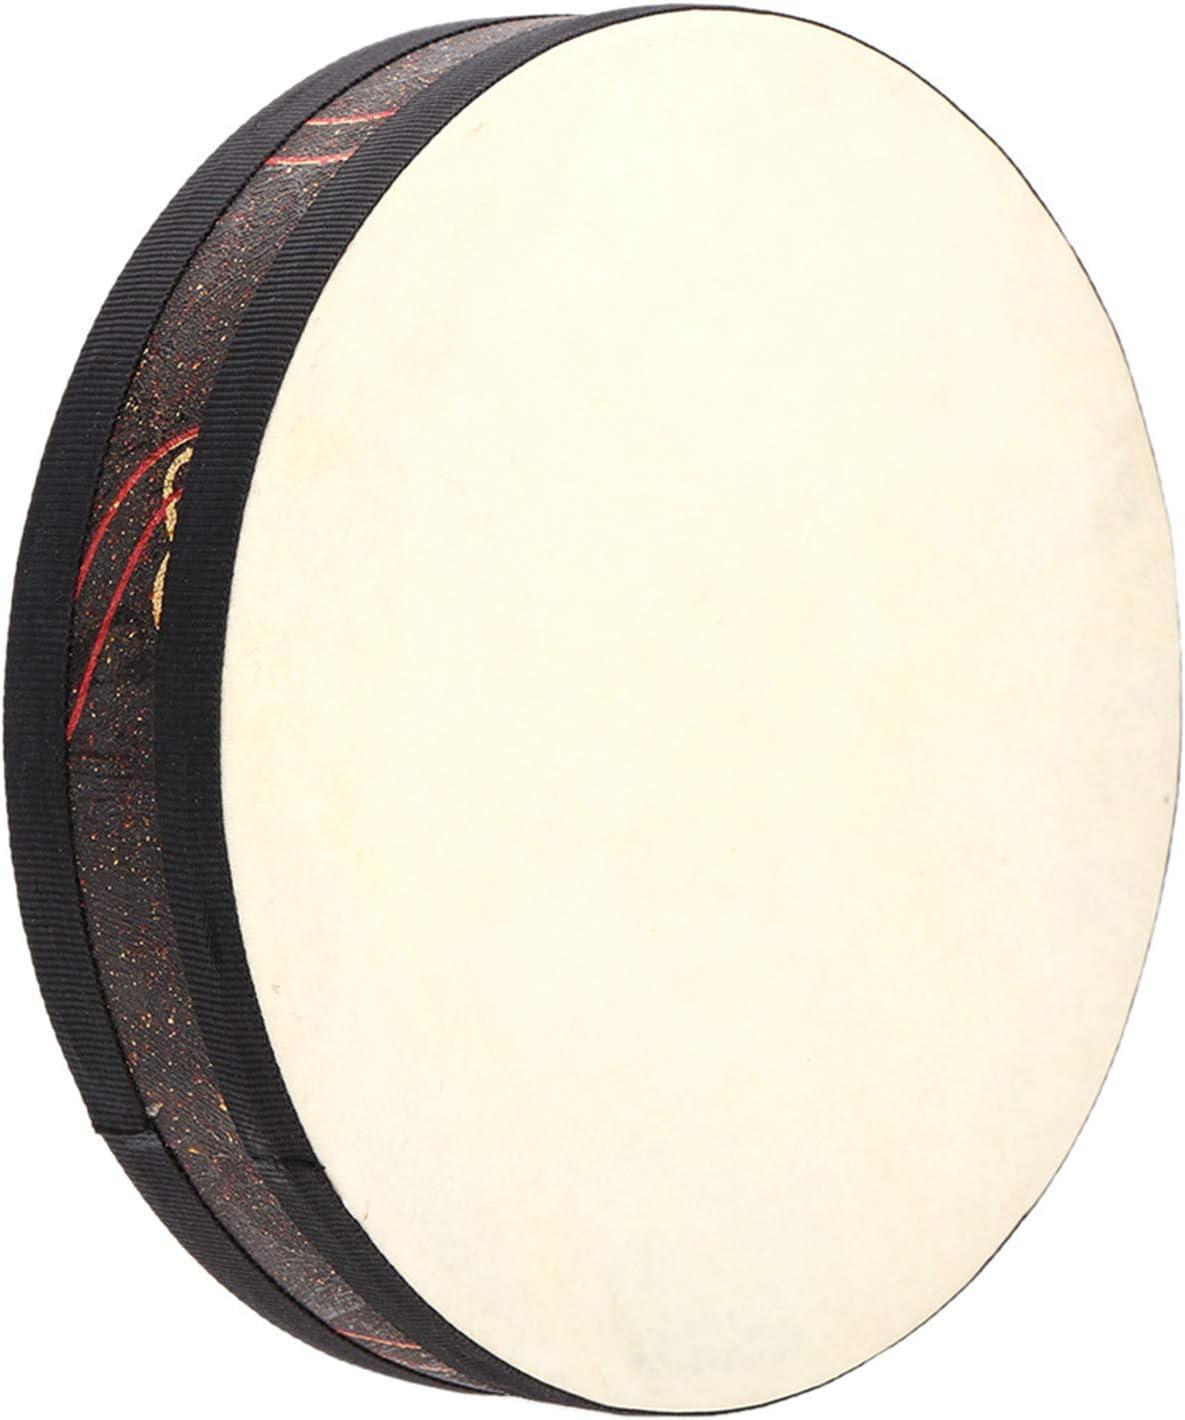 Iycorish 10 Inch Ocean Wave Bead Drum Gentle Sea Sound Musical Instrument